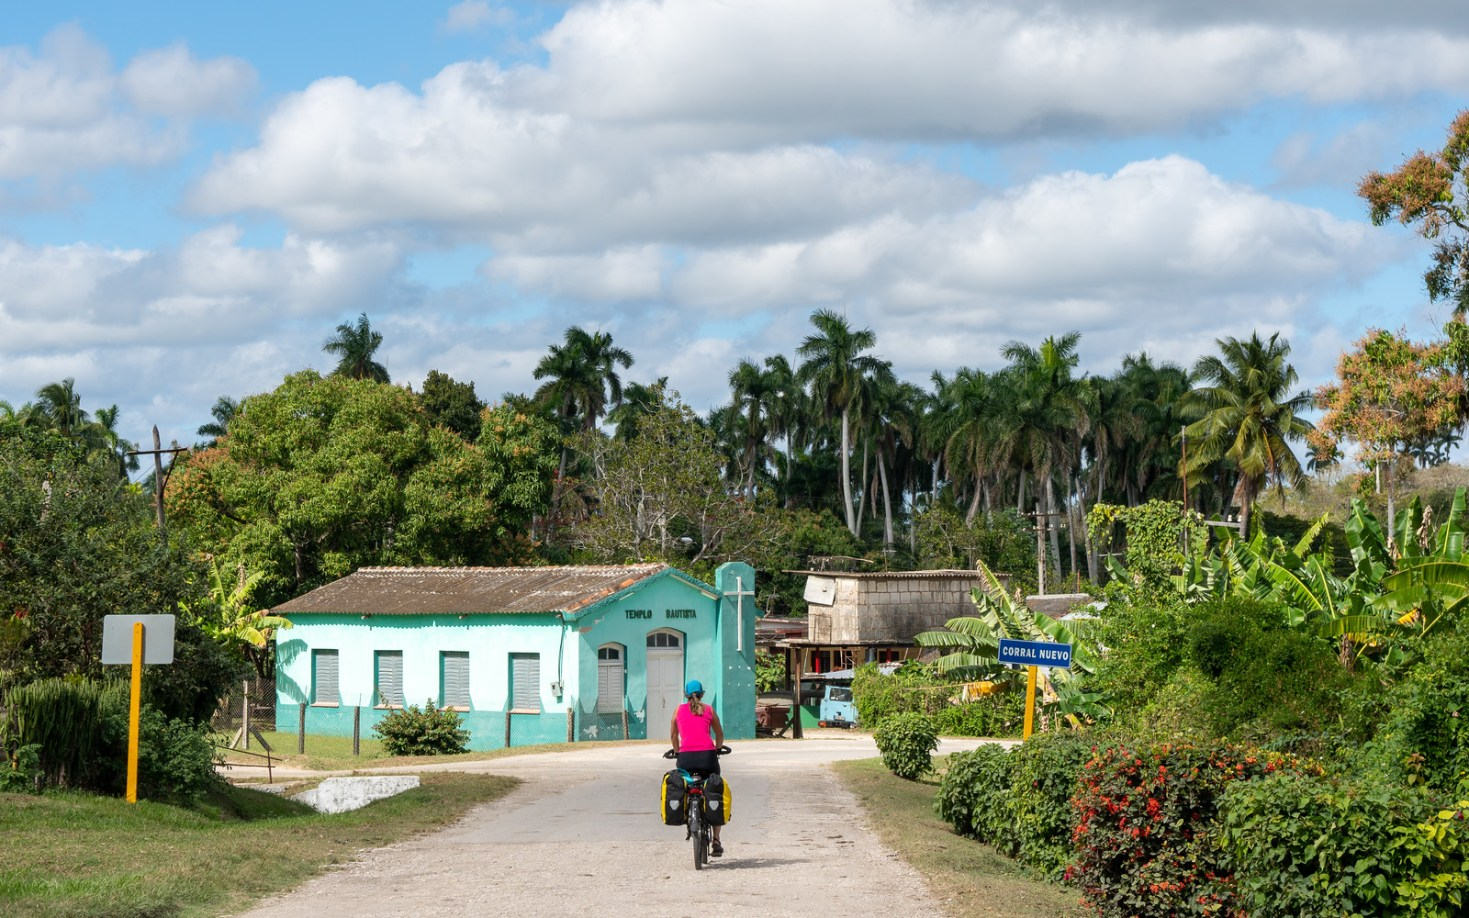 Cycling through a tropical landscape